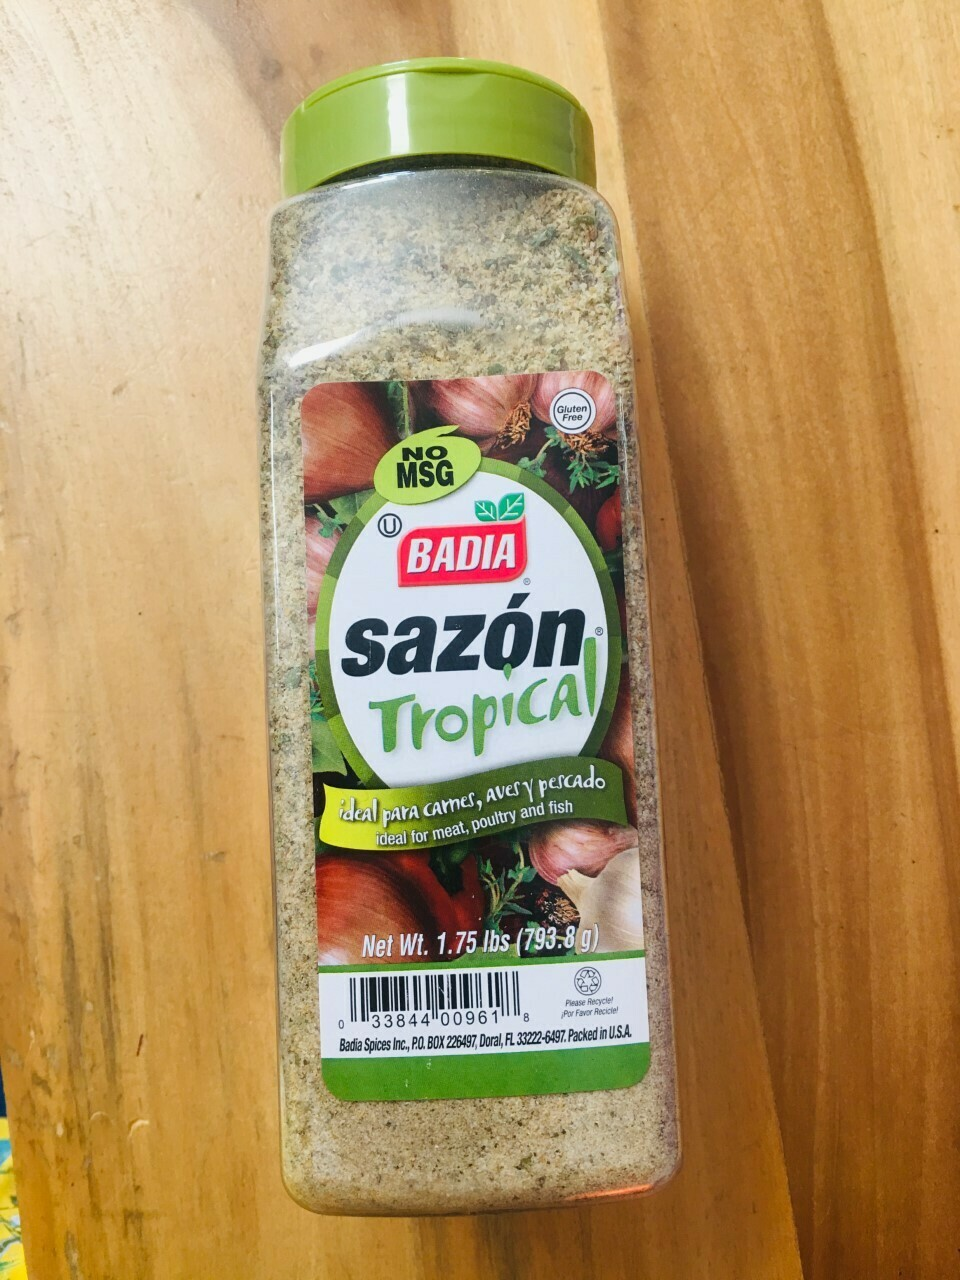 Badia sazon tropical seasoning 1.75 lbs (No MSG)